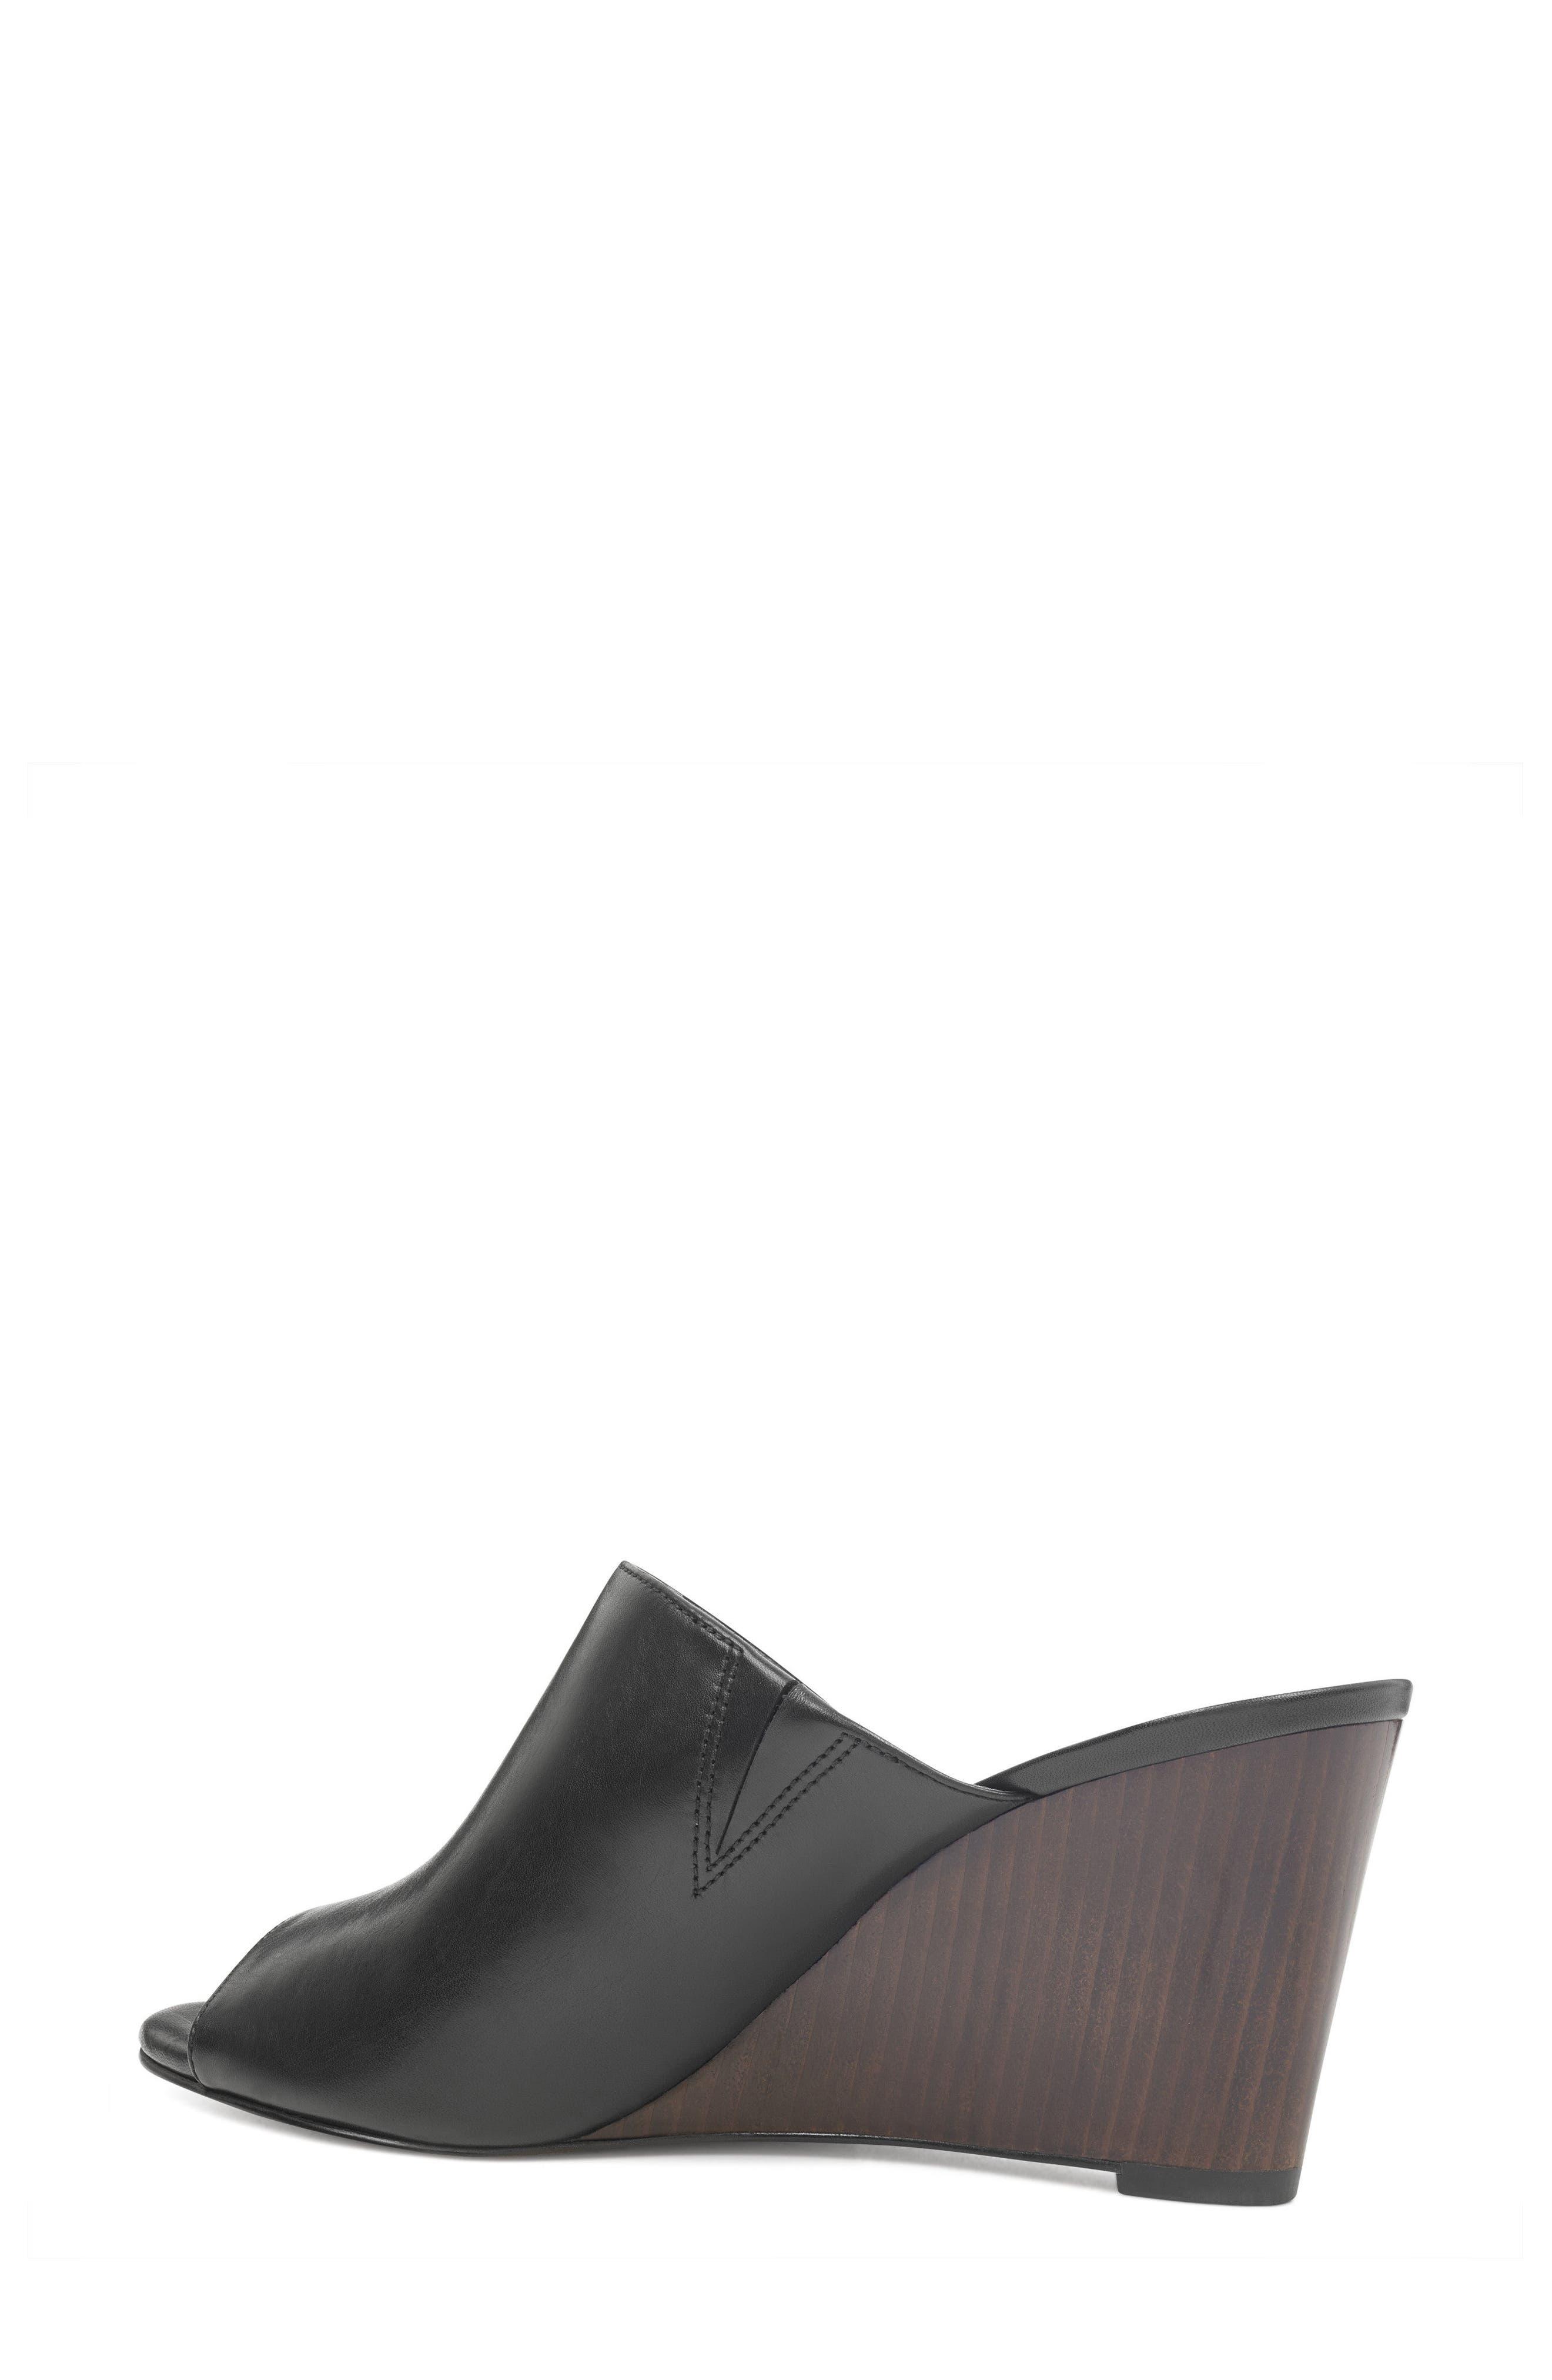 Janissah Wedge,                             Alternate thumbnail 2, color,                             Black Leather